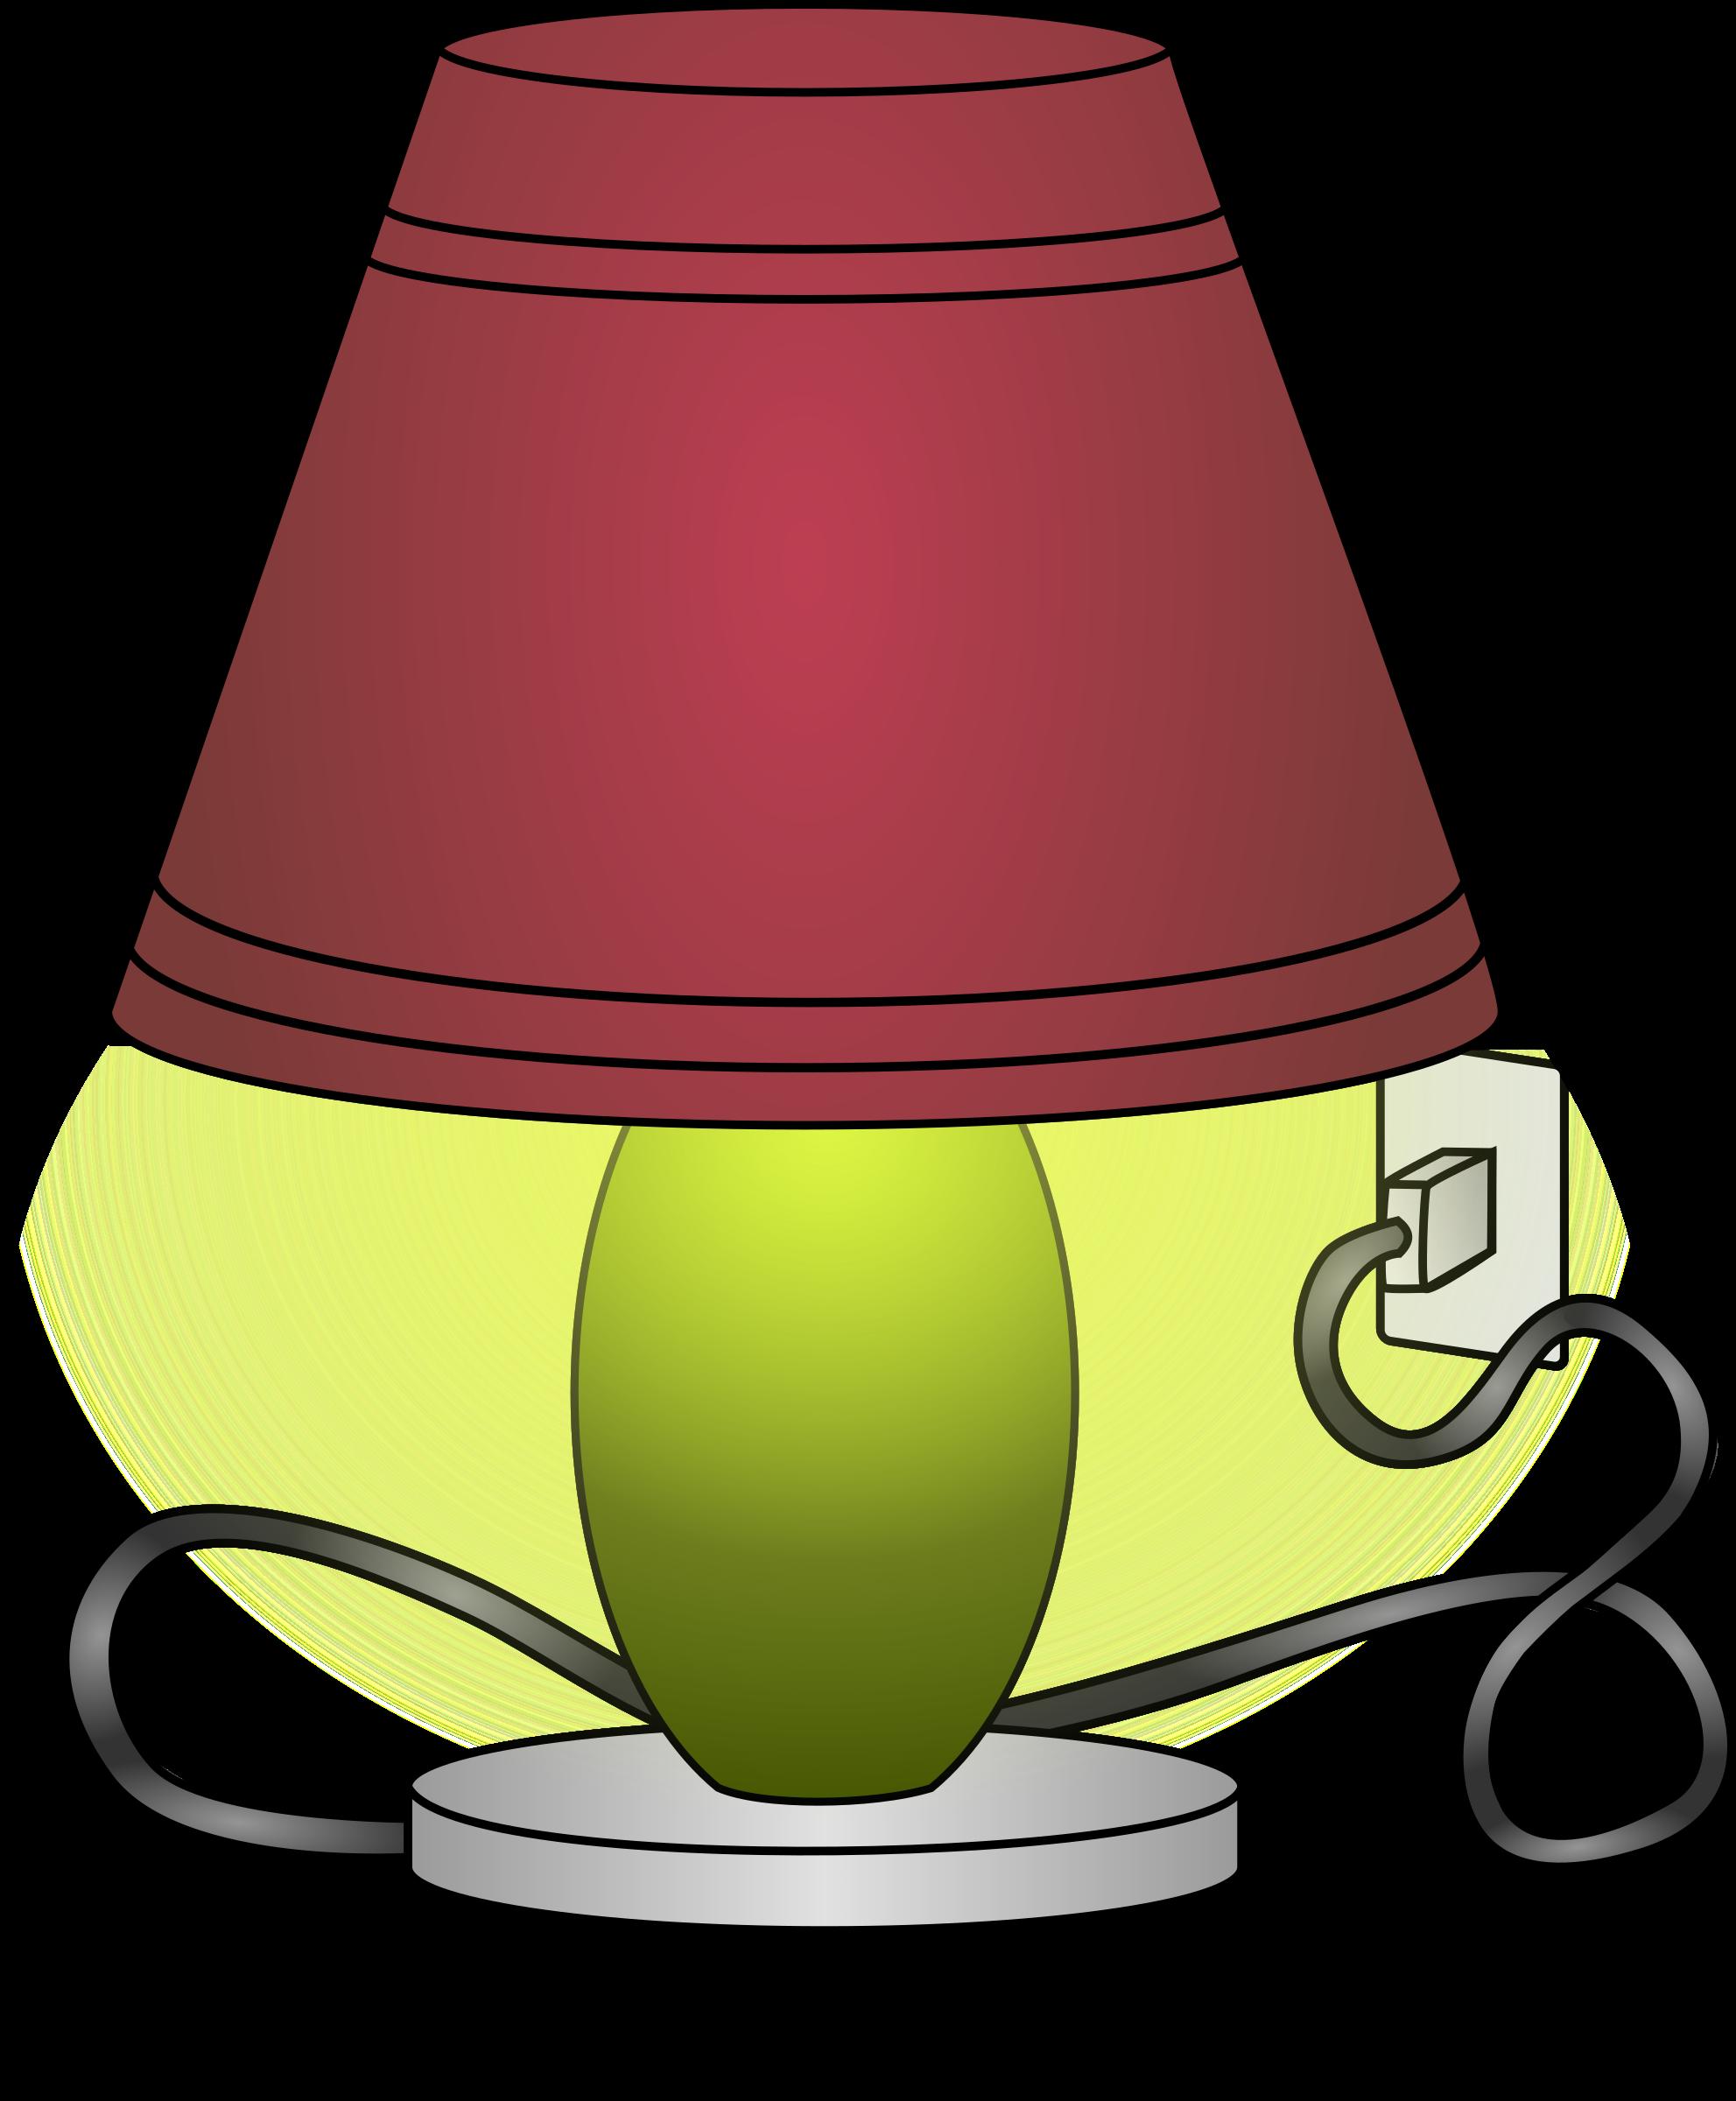 Powerpoint presentation httpsopenclipartorgimagepxsvgtopnglamp . Lamp clipart house